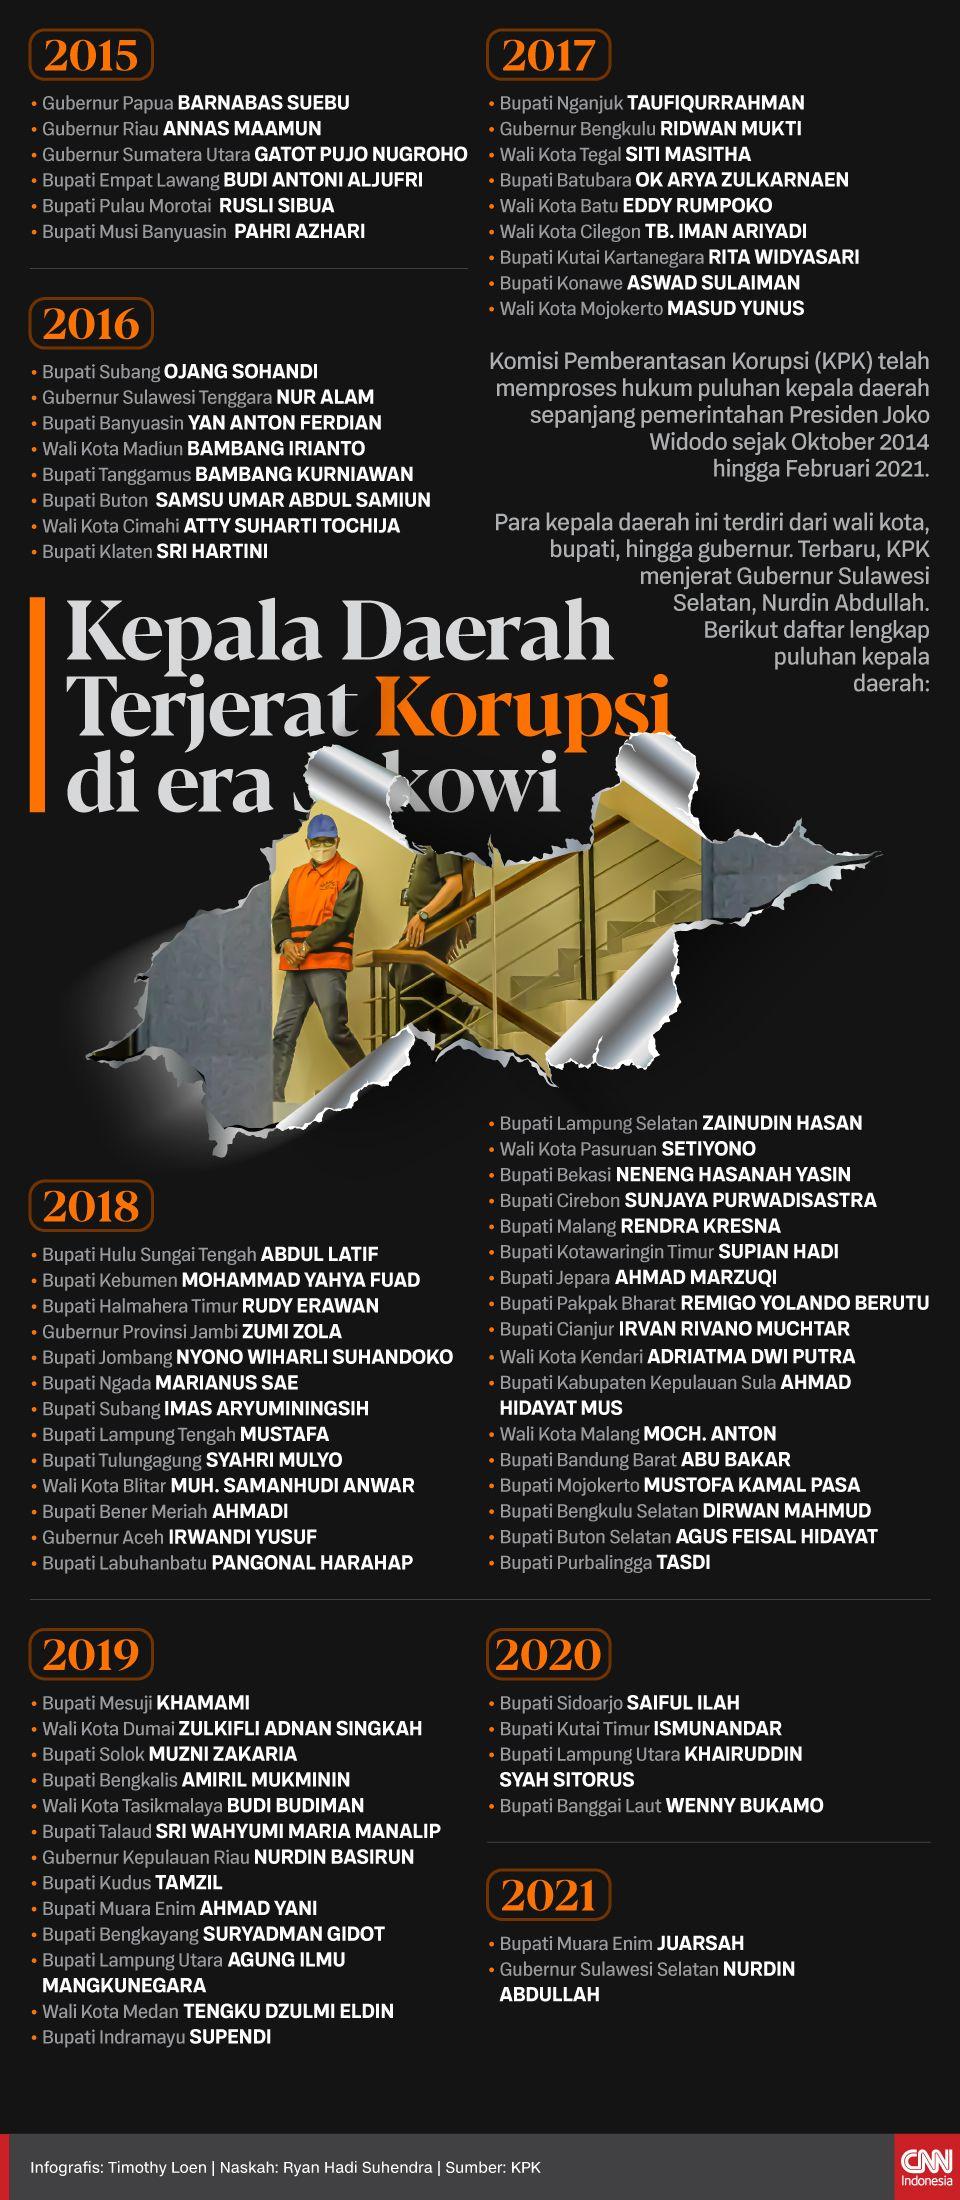 Infografis Kepala Daerah Terjerat Korupsi di era Jokowi